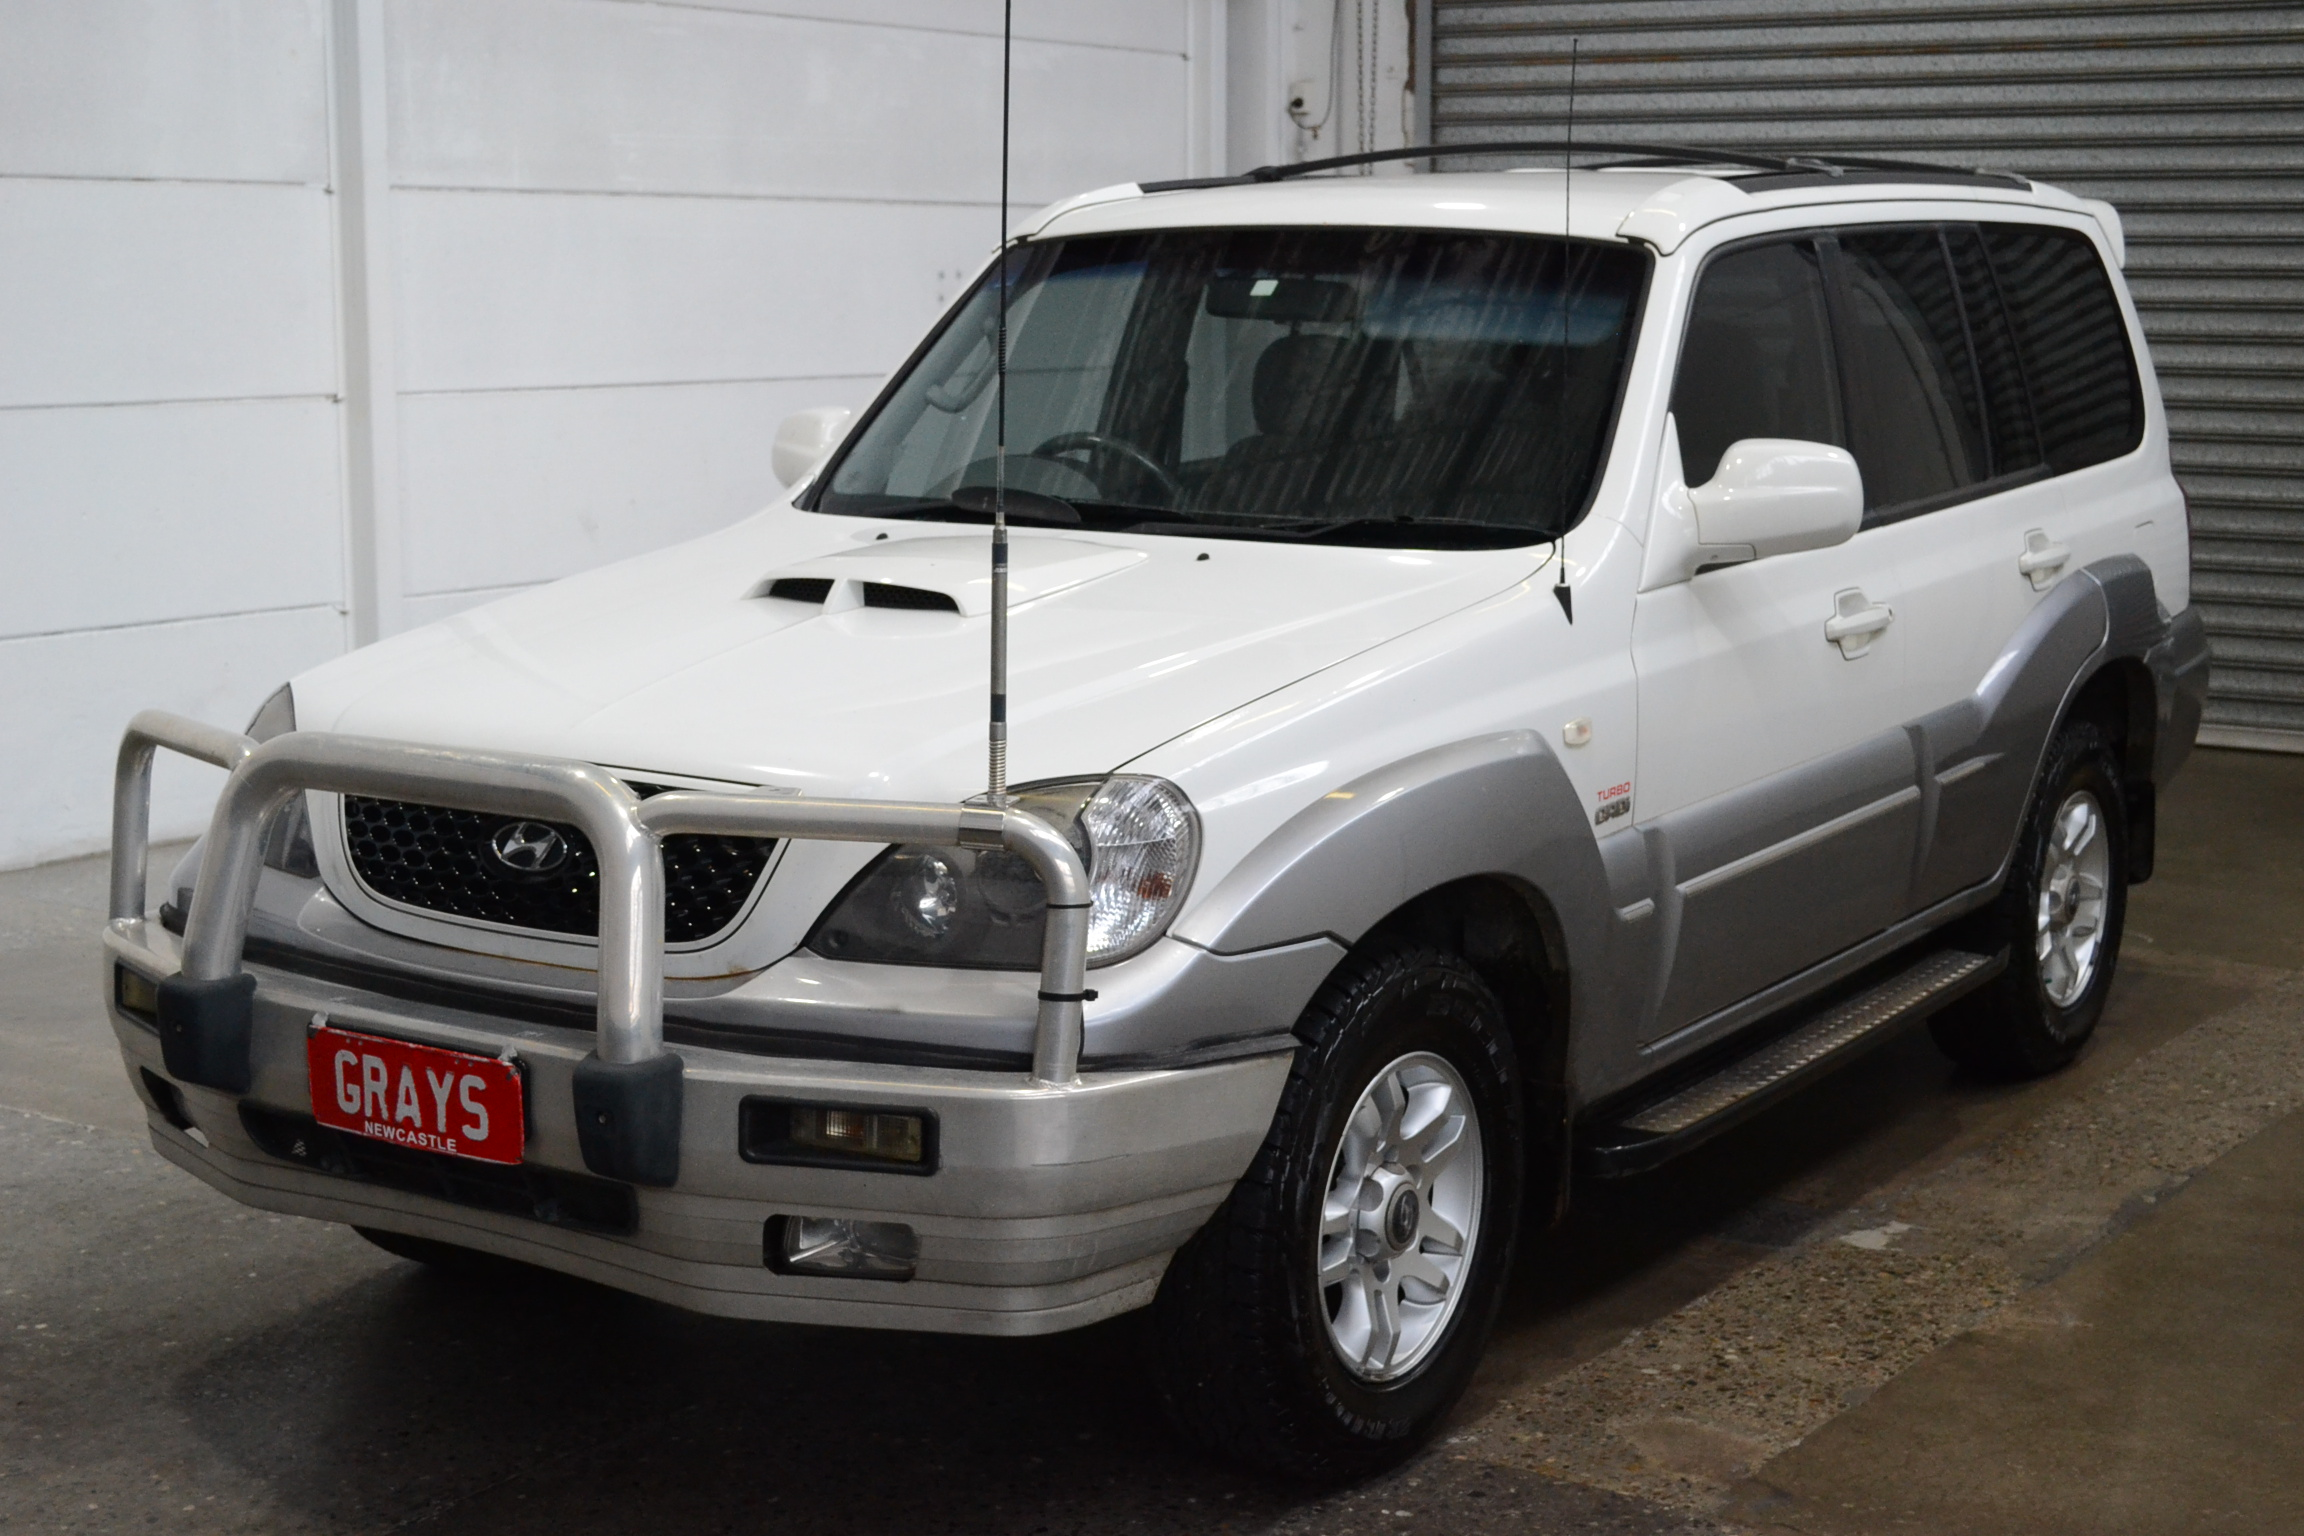 2006 Hyundai Terracan CRDi Turbo Diesel Automatic 7 Seats Wagon